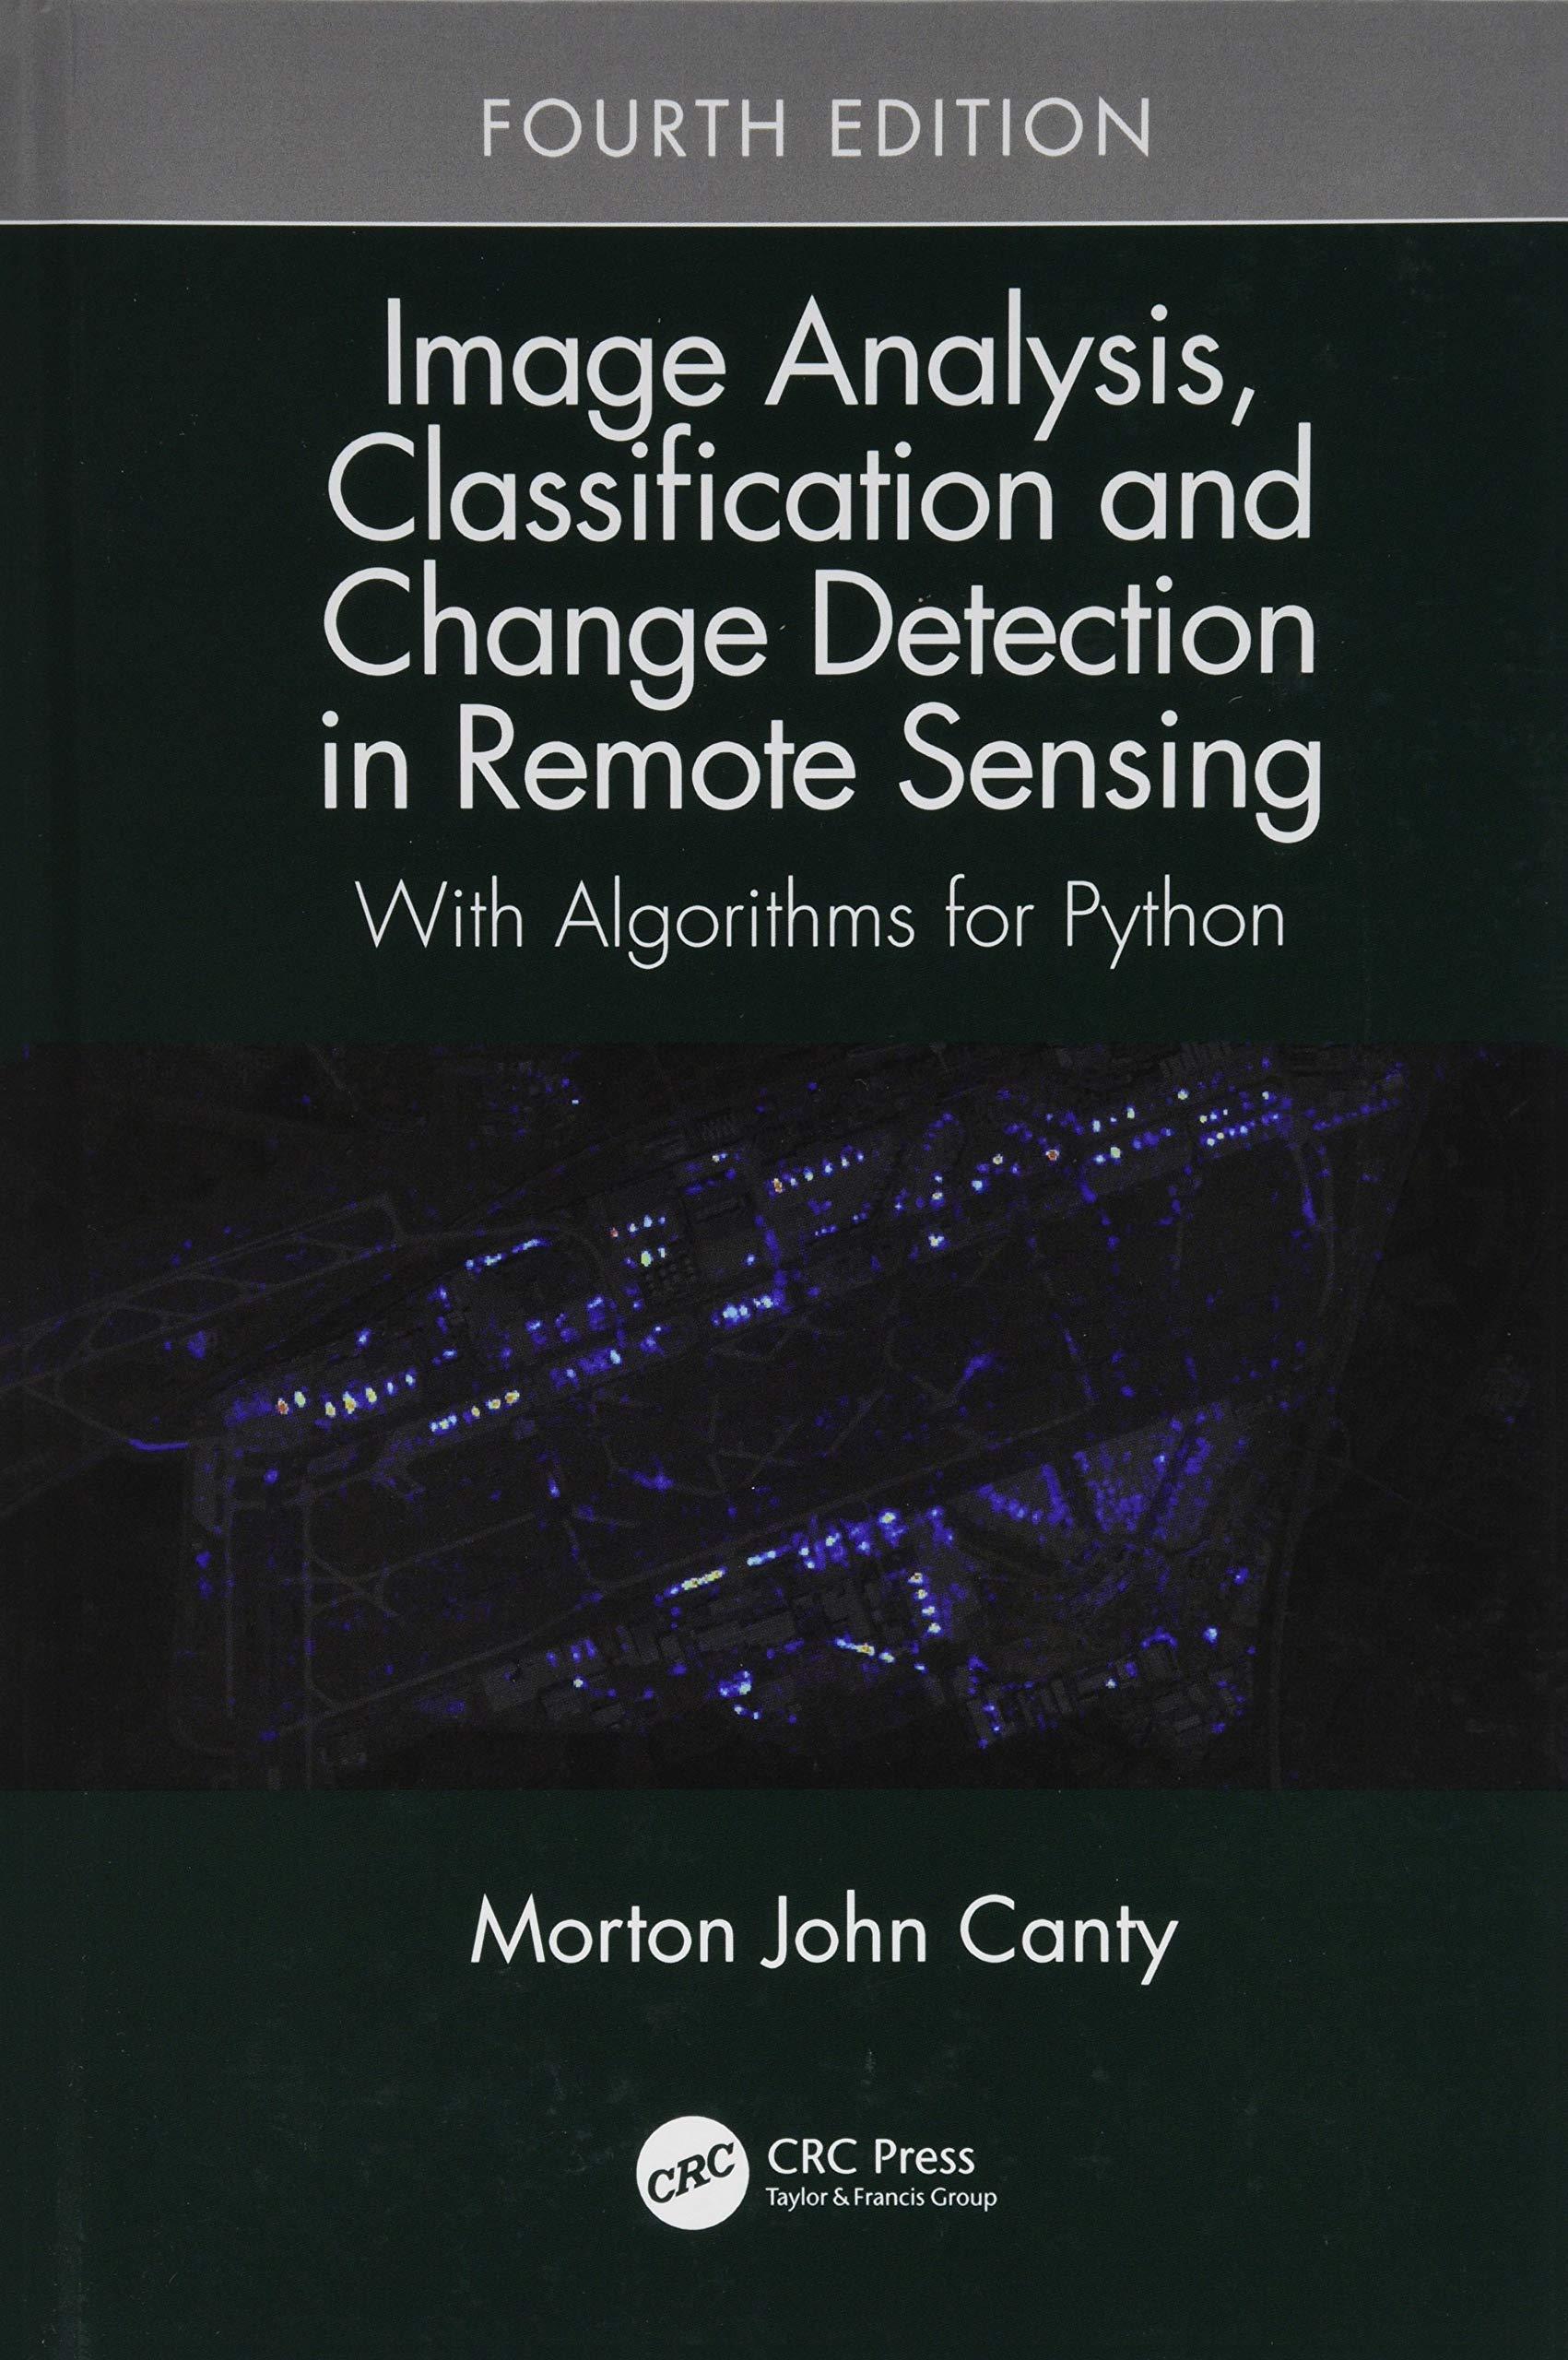 Amazon fr - Image Analysis, Classification and Change